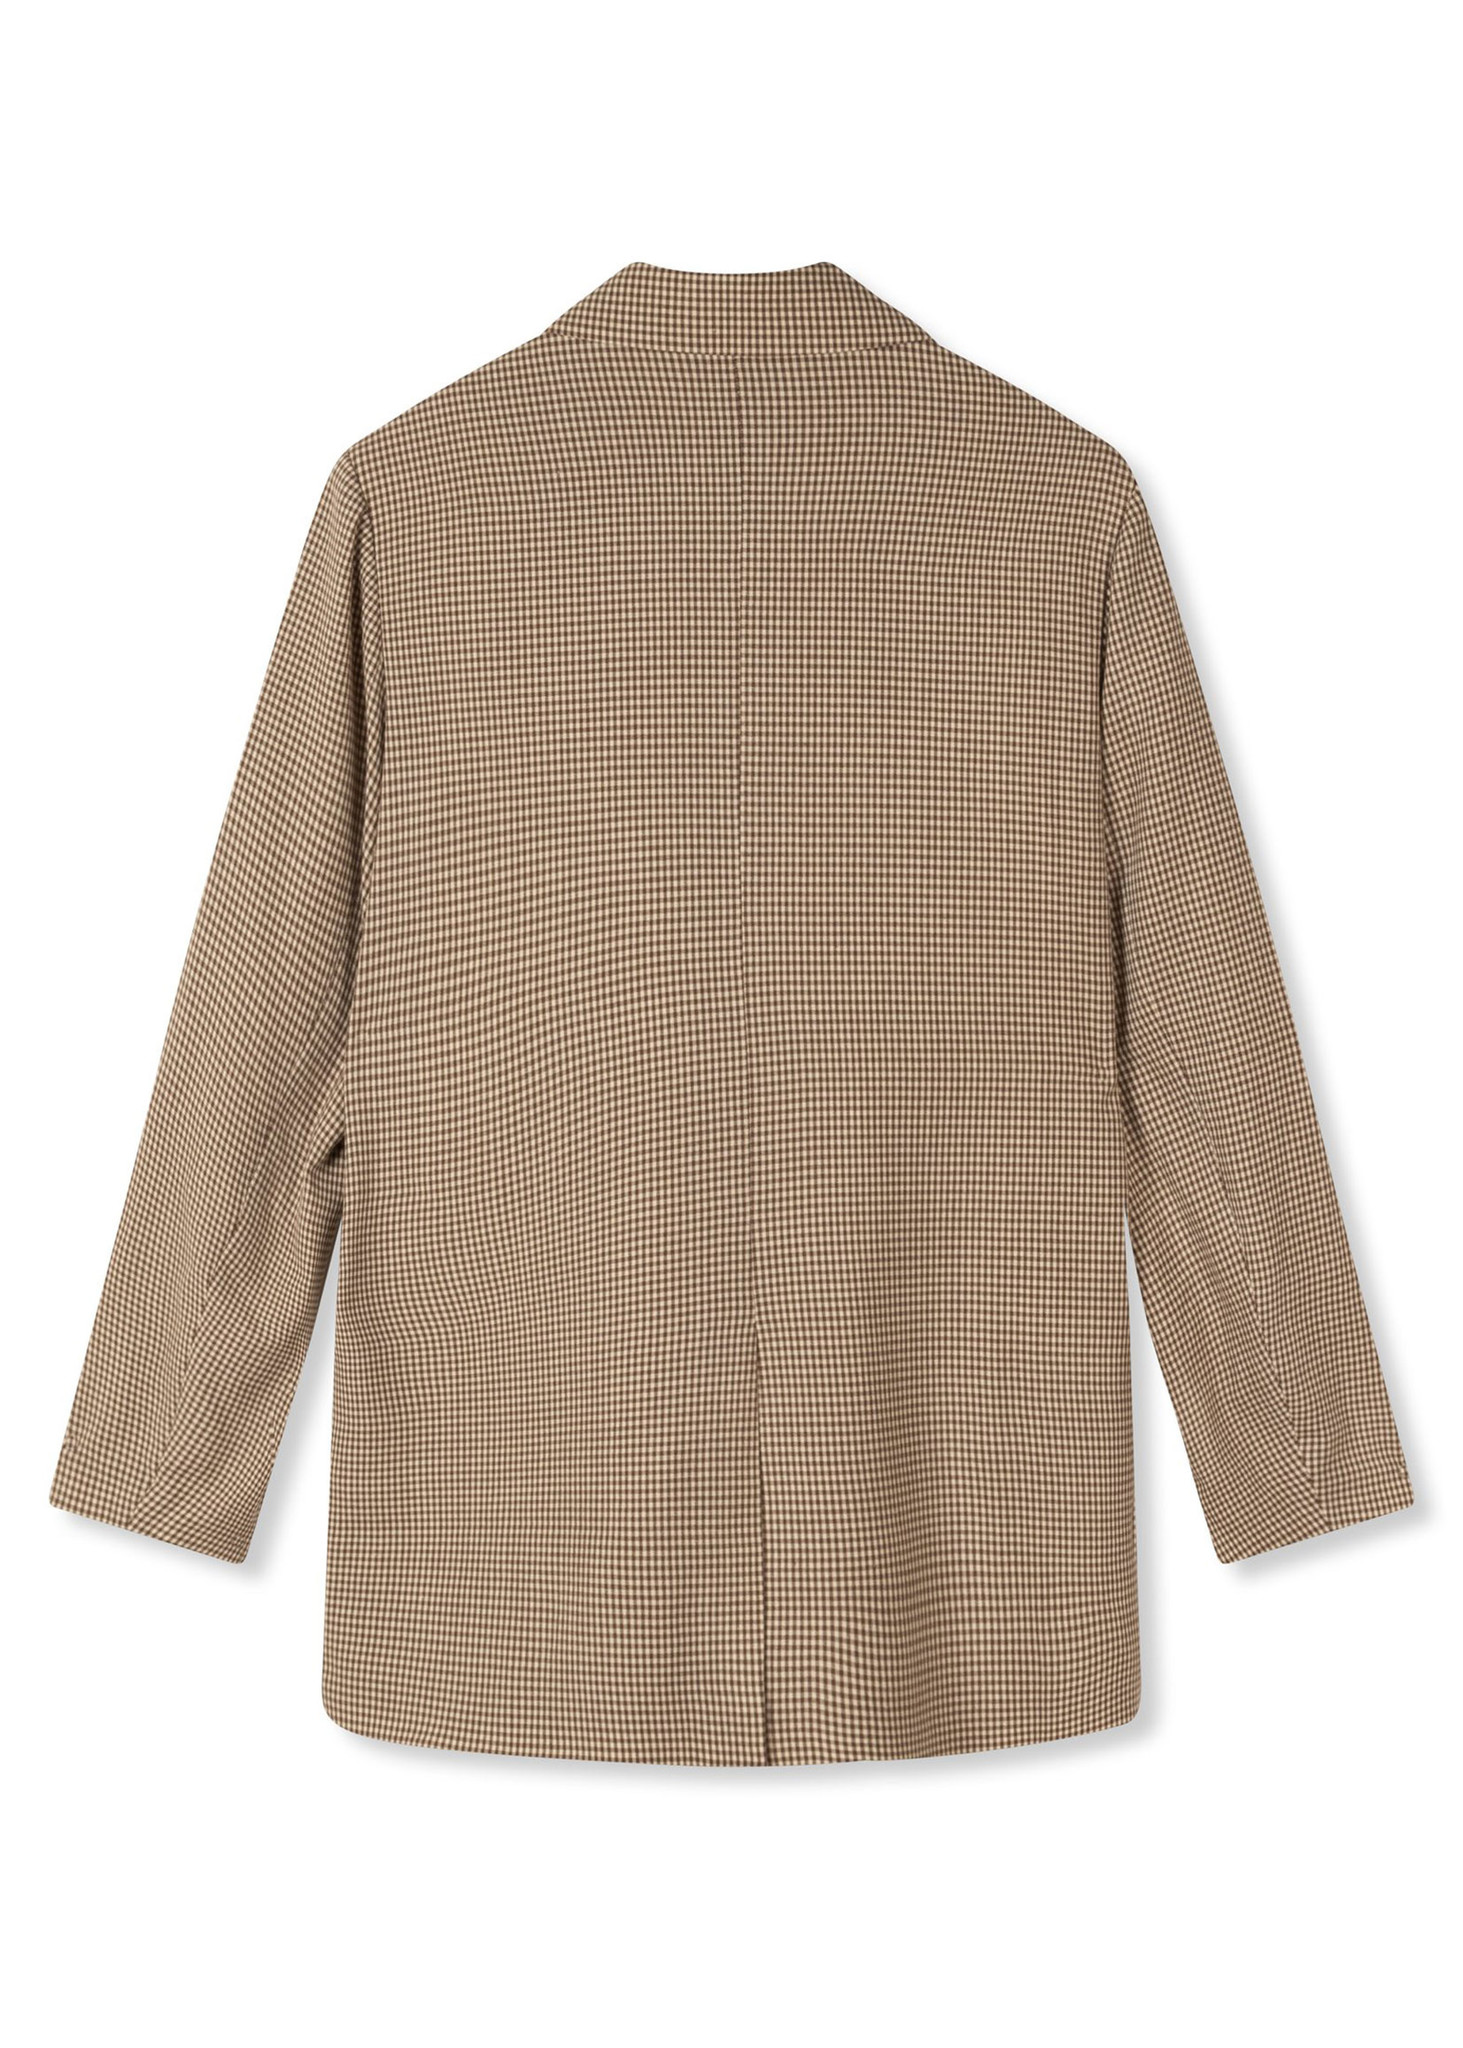 Woven Check Blazer Brown-6